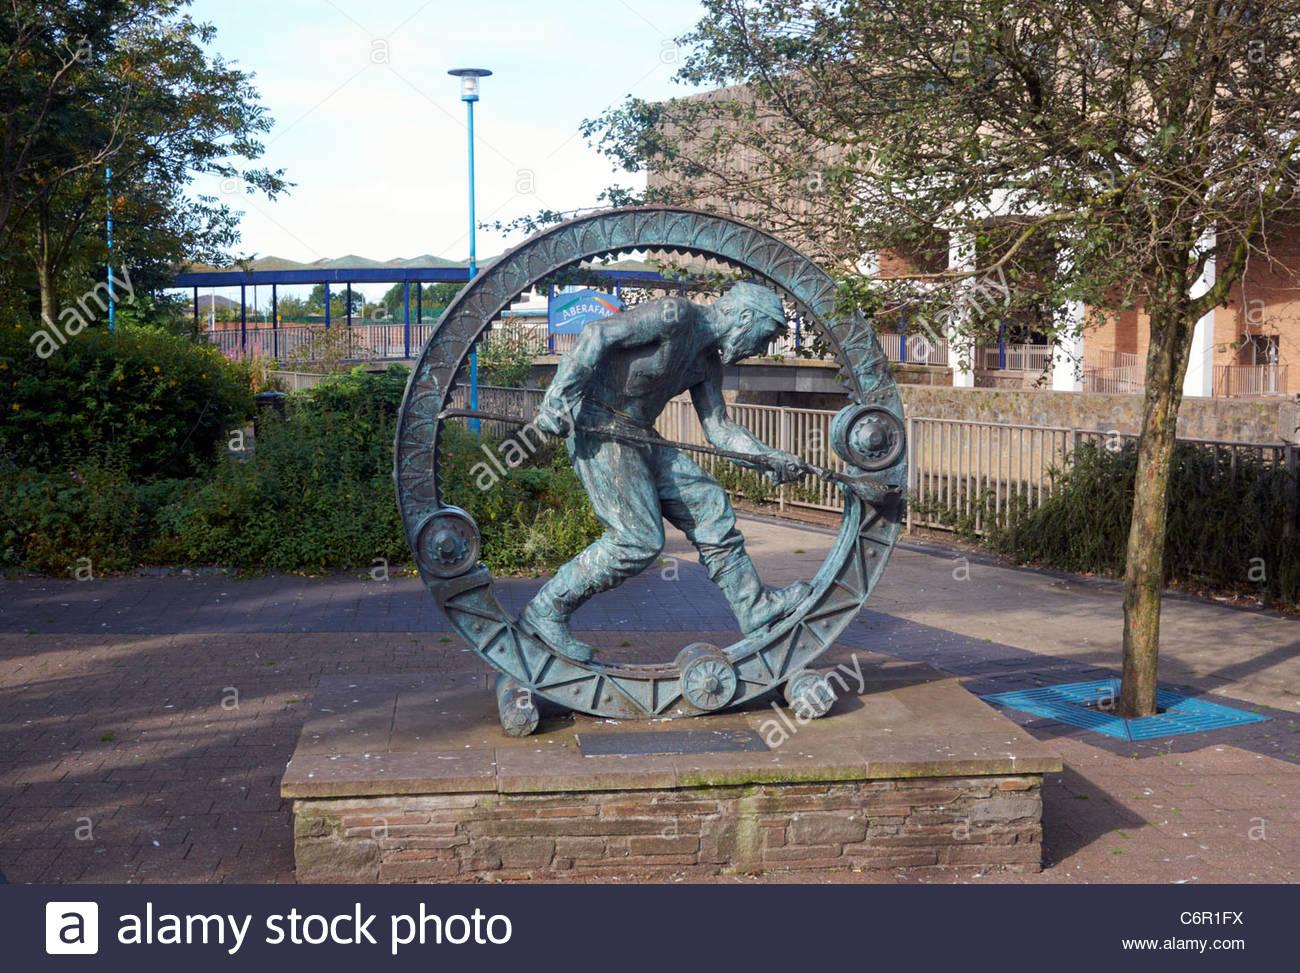 Sebastien Boyesen sculpture of Mortal coil commemorating the steel industry in port talbot south wales - Stock Image